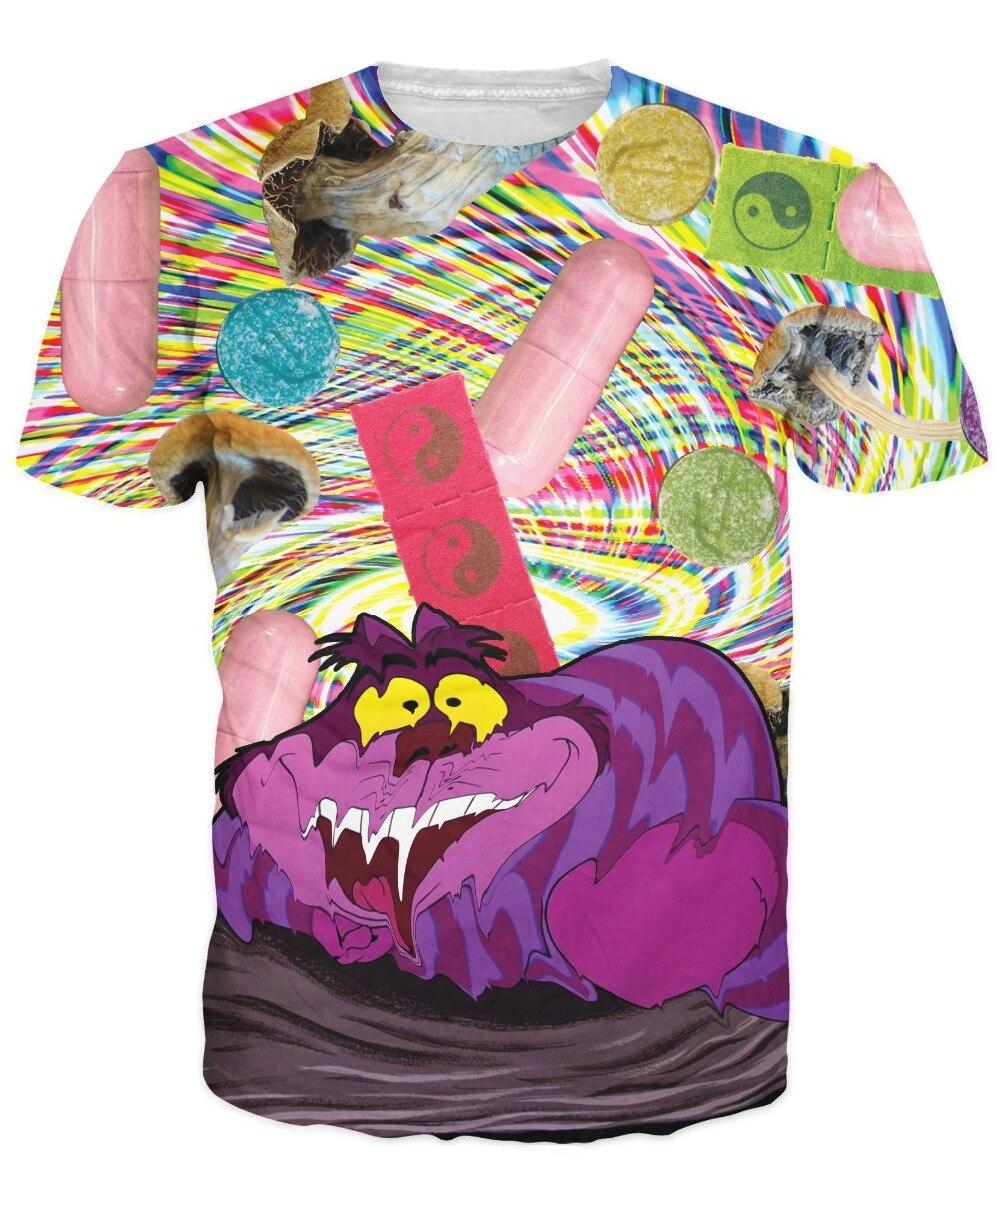 Man/'s T-shirt Cartoon Cheshire cat Printed Short Sleeve t-shirt S-6XL T-shirt